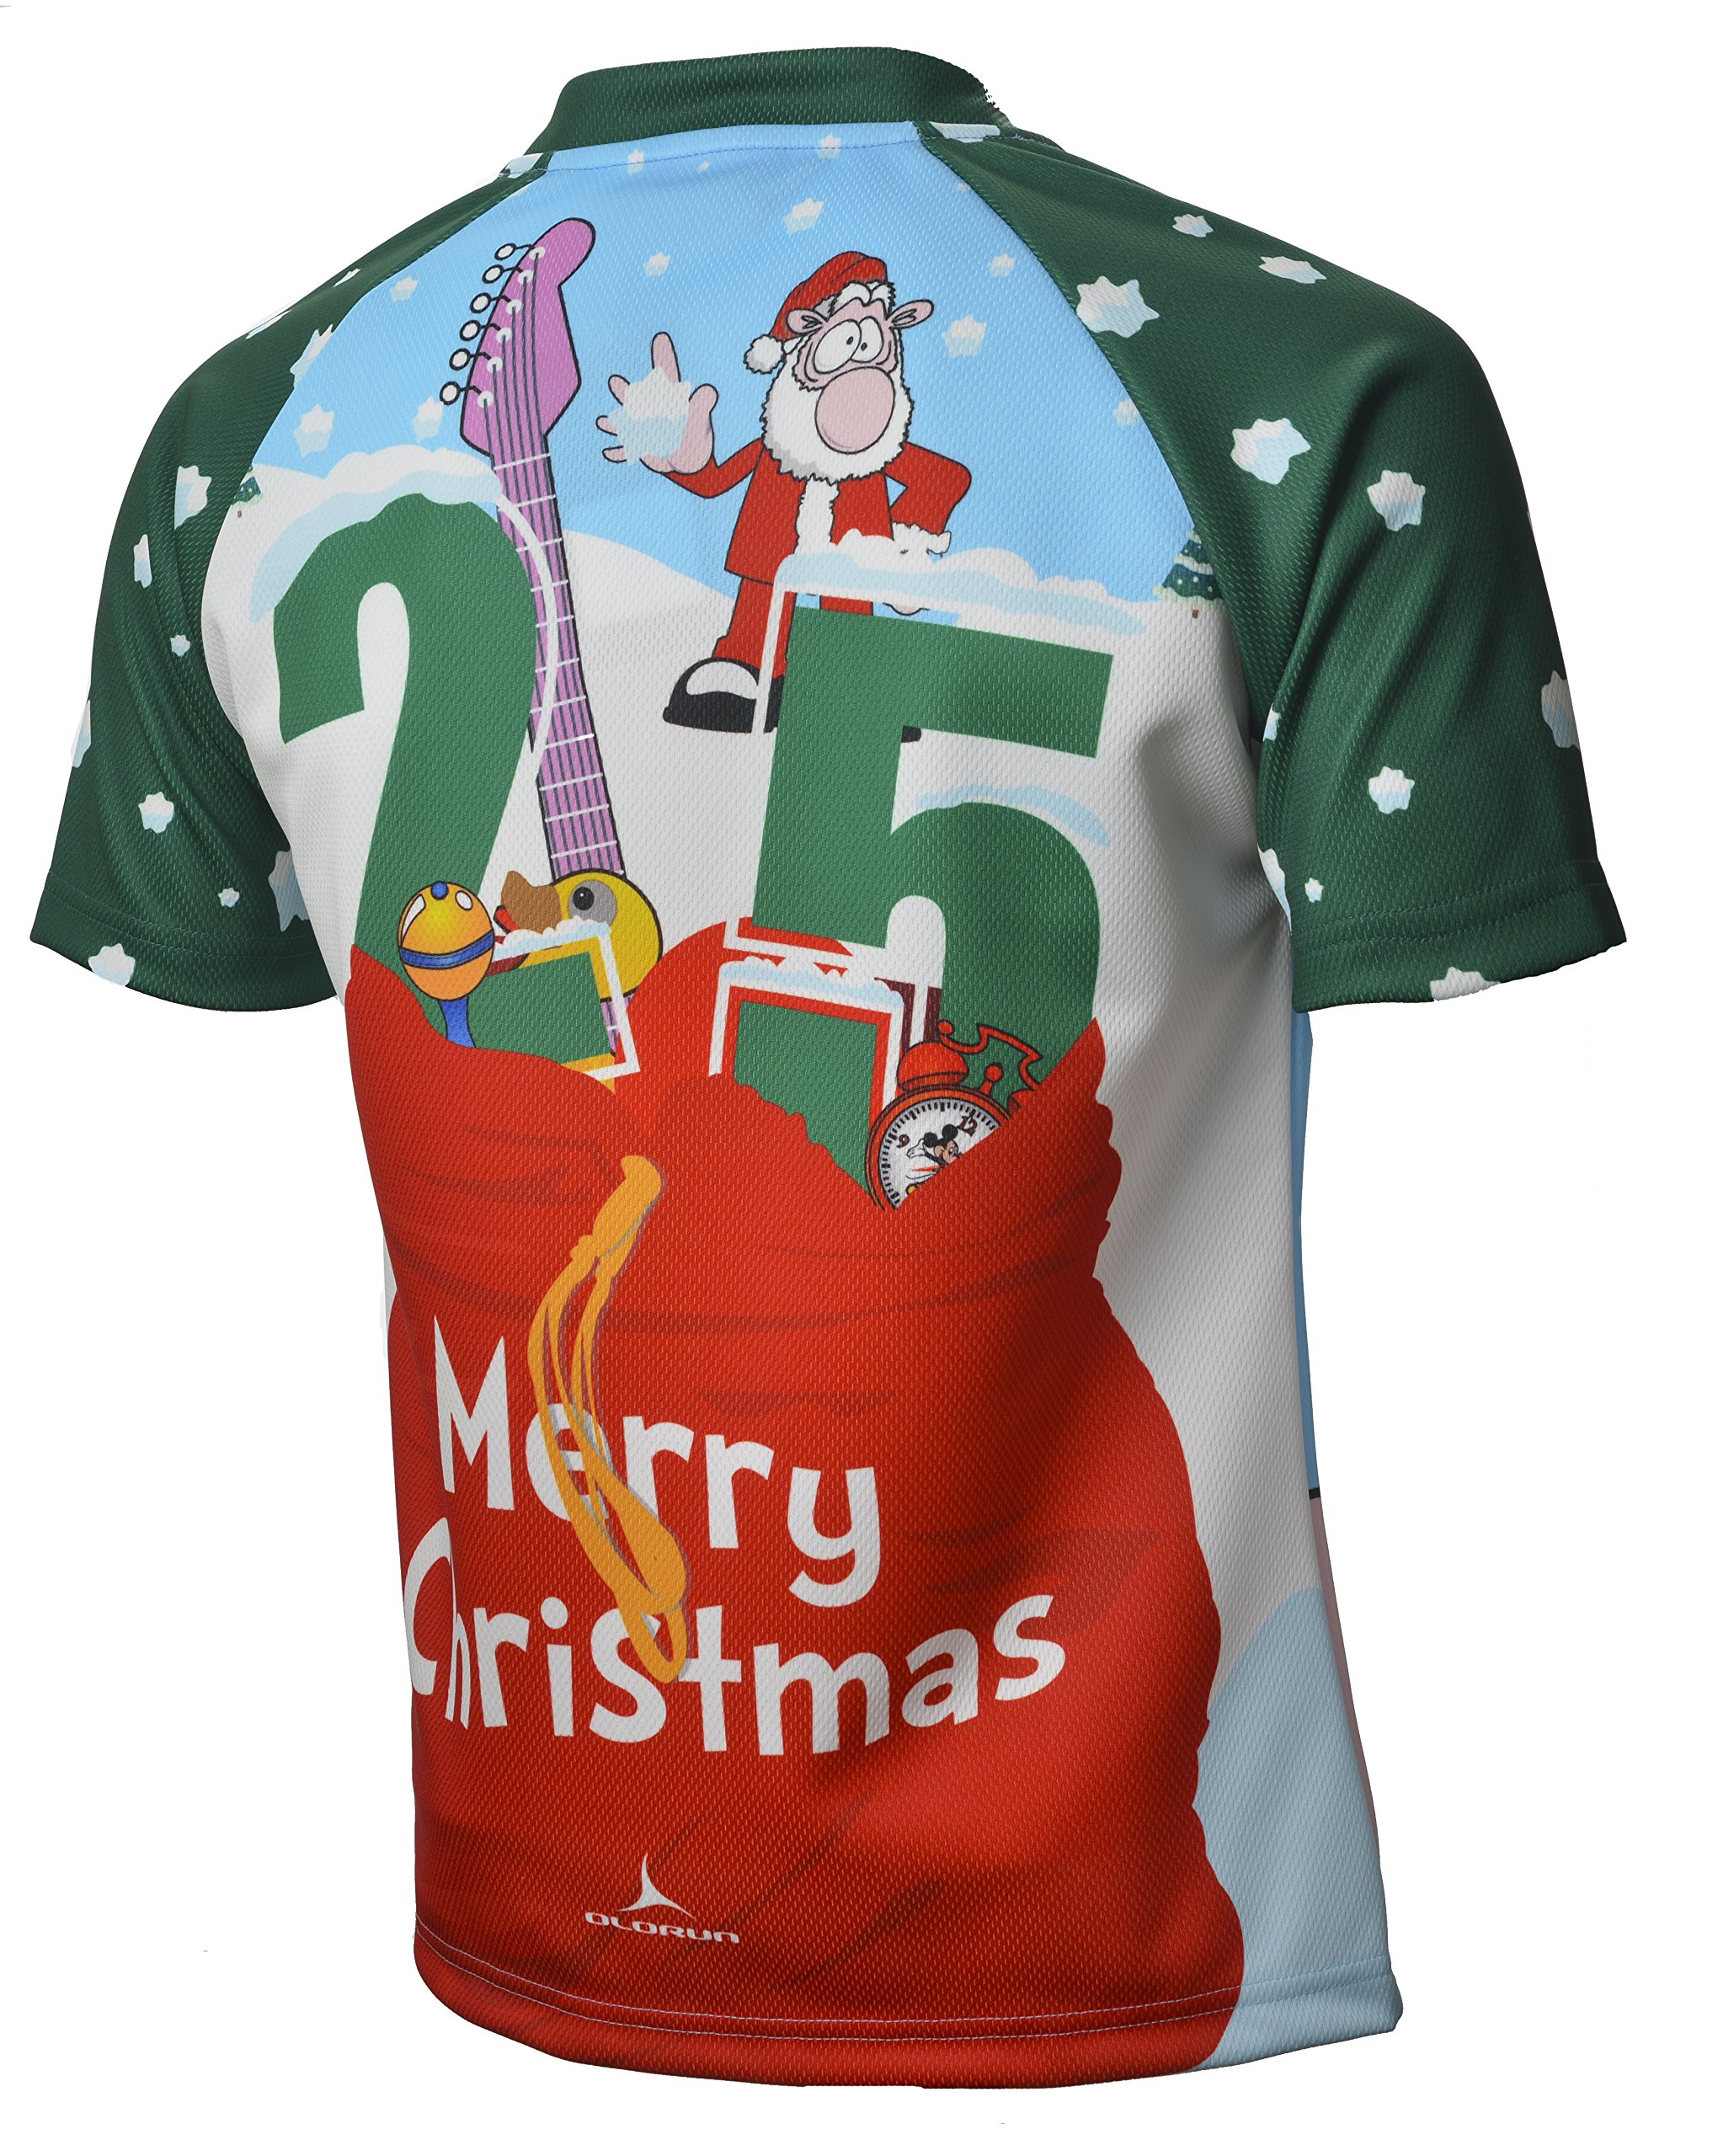 Christmas Jersey Design.Santa 7 S New 2014 Rugby Shirt Christmas Jumper Design S Xxxxl